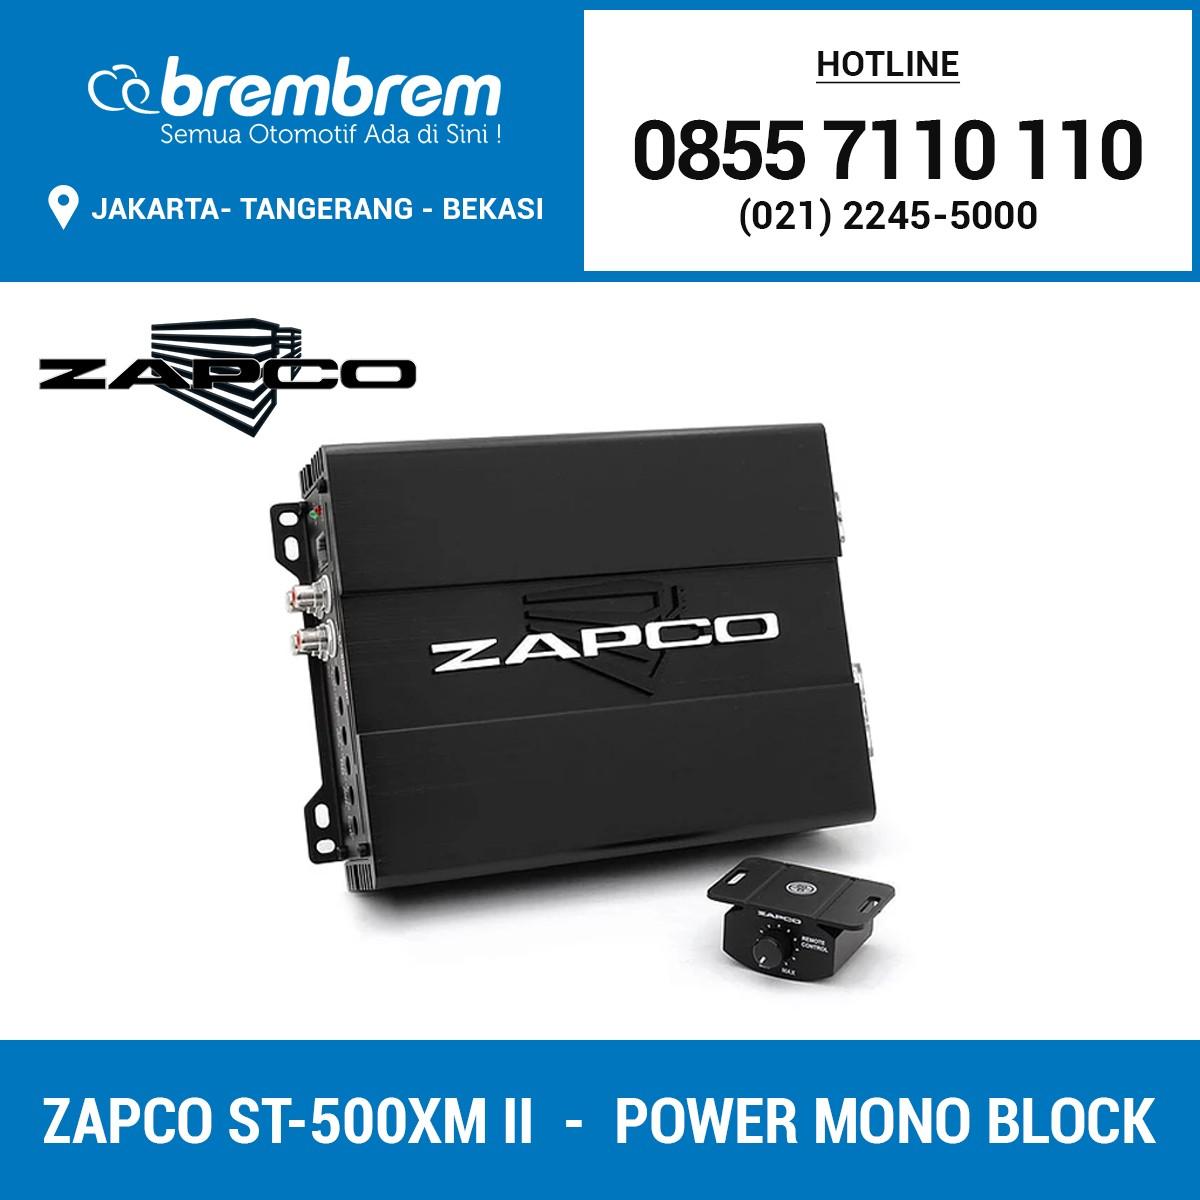 ZAPCO ST-500XM II - POWER MONOBLOCK